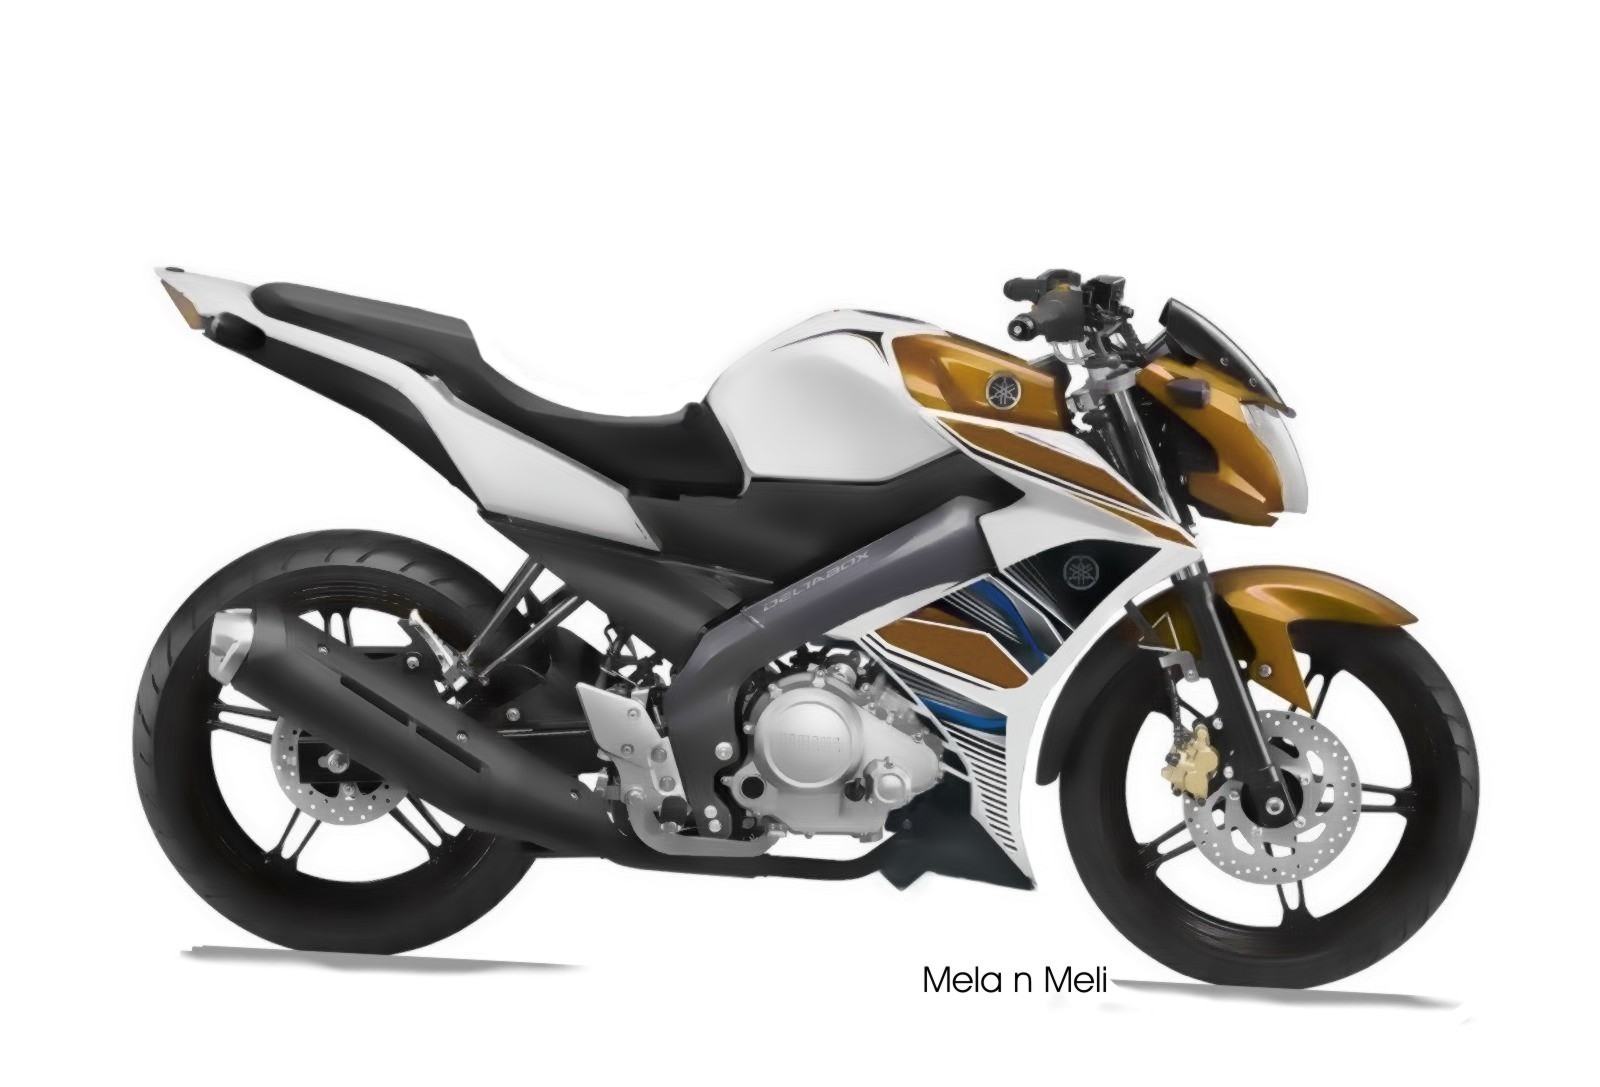 Modif Simpel Yamaha New Vixion